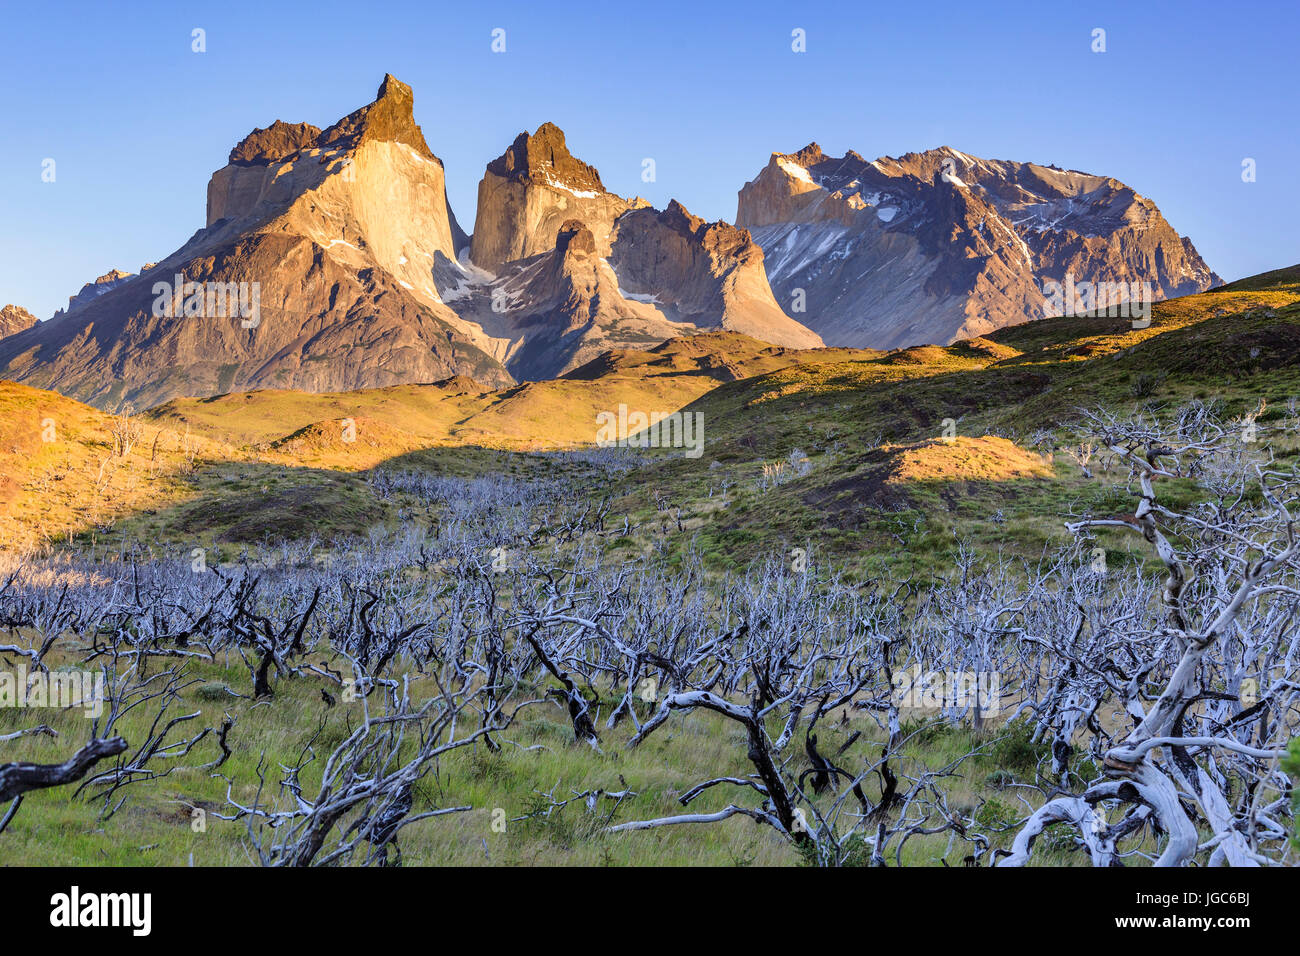 Cuernos del Paine at sunrise, Torres del Paine National Park, Patagonia, Chile - Stock Image